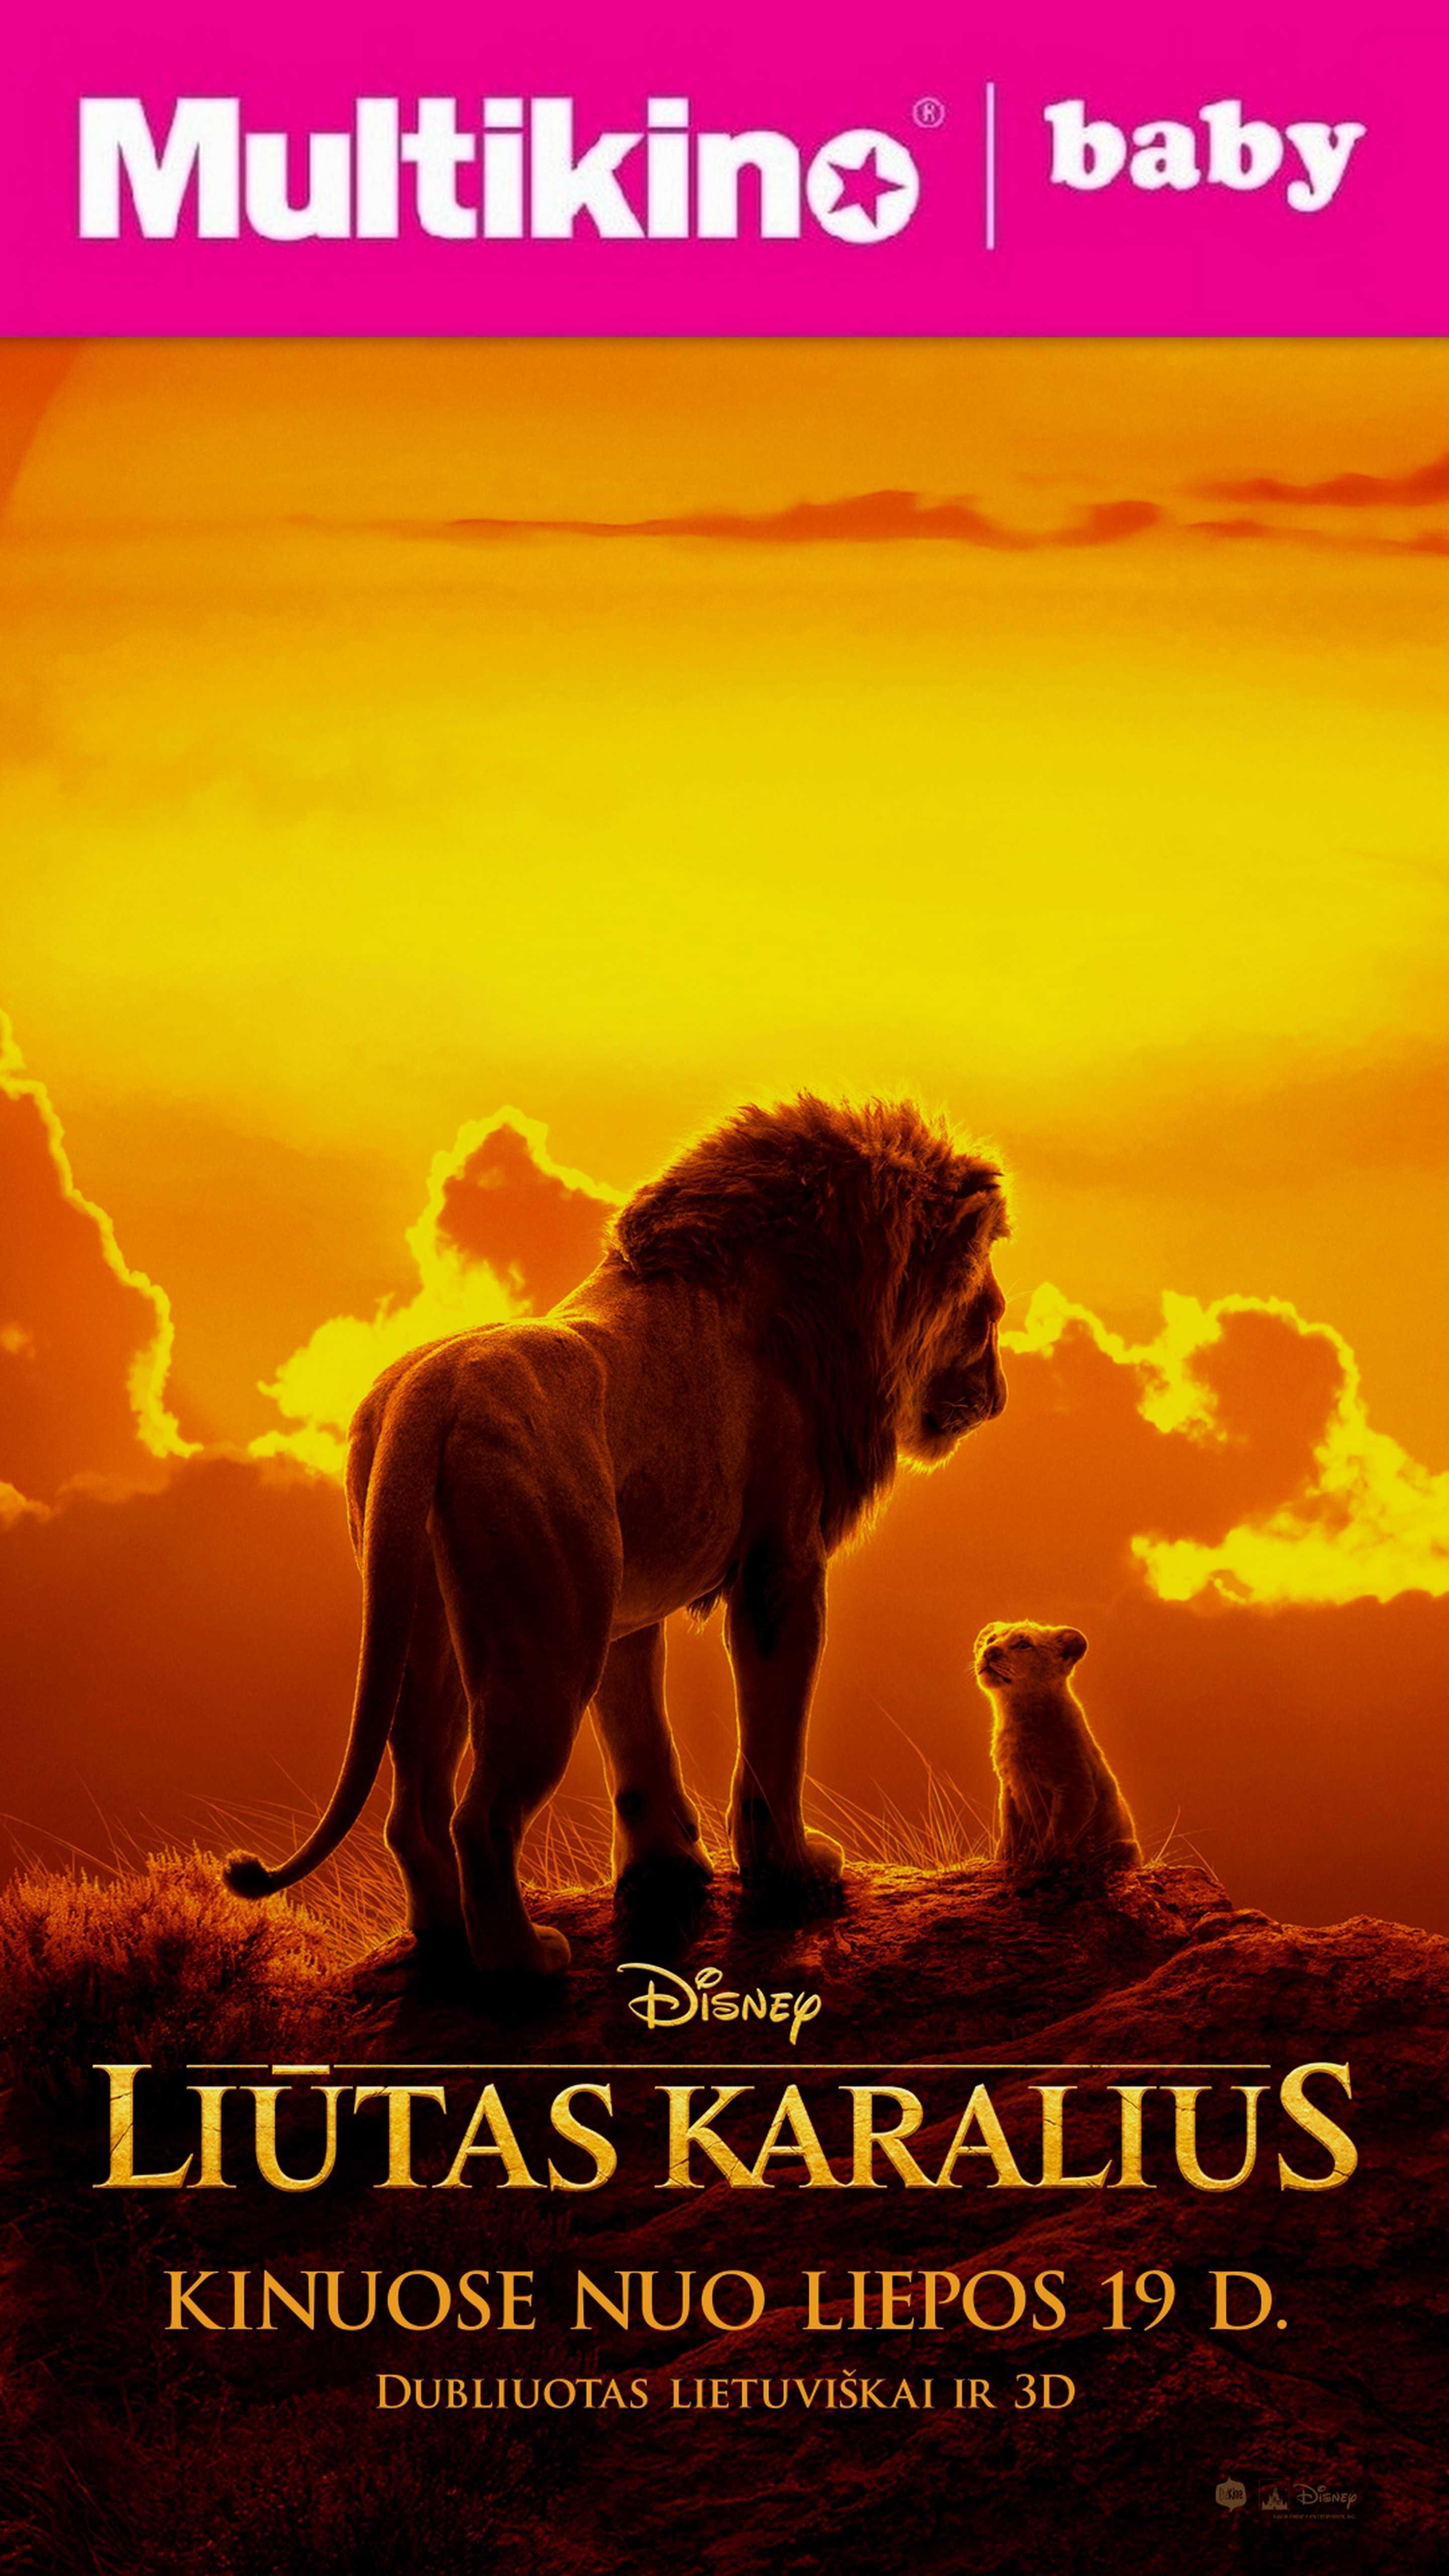 MultiBabyKino: LIŪTAS KARALIUS (Lion King)